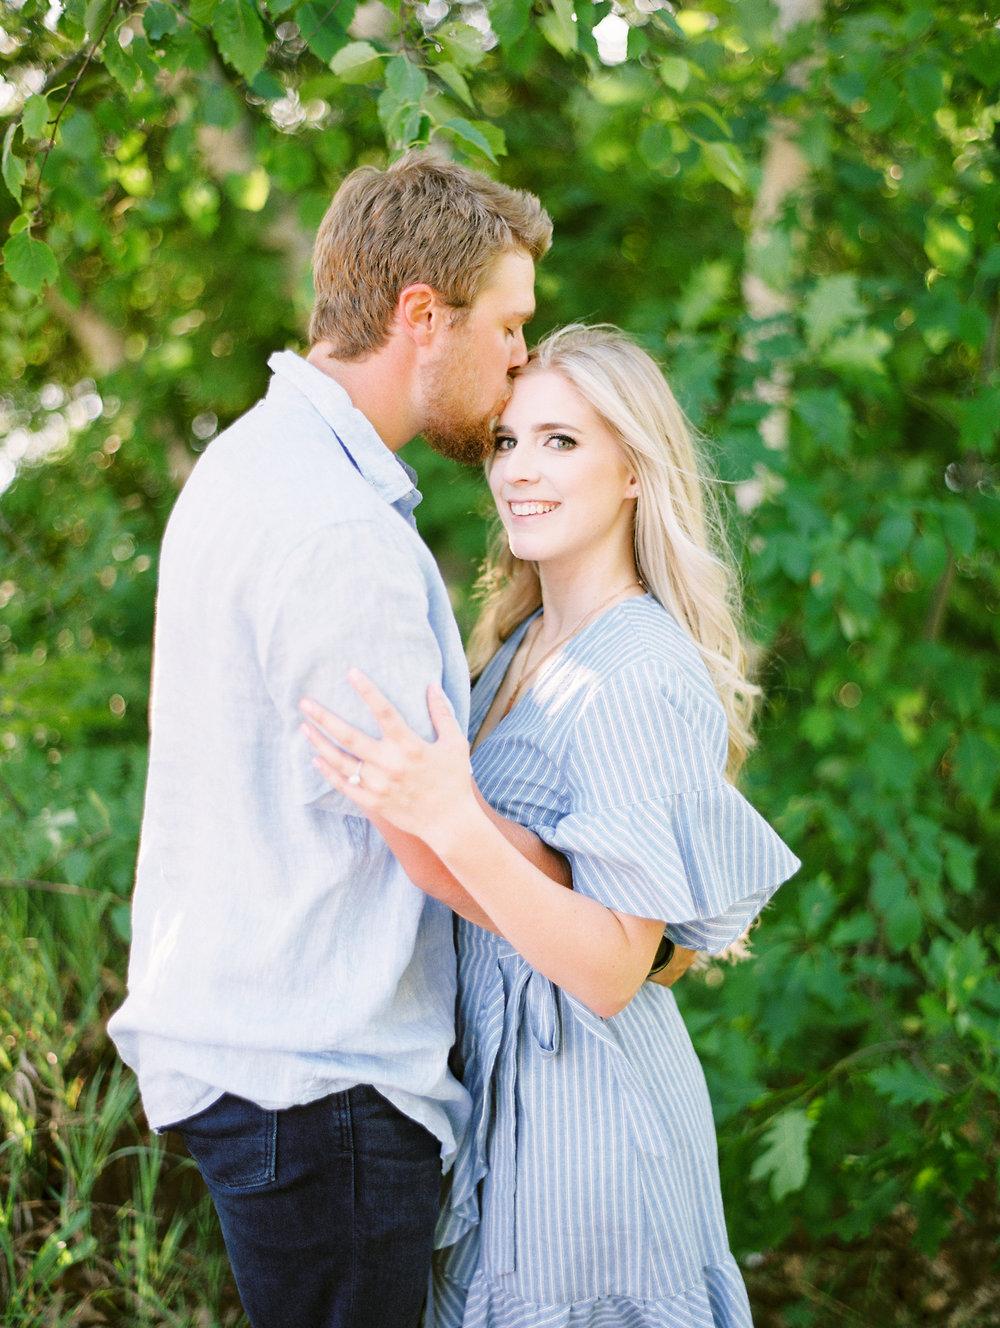 Hannah+Kyle+Engaged-104.jpg